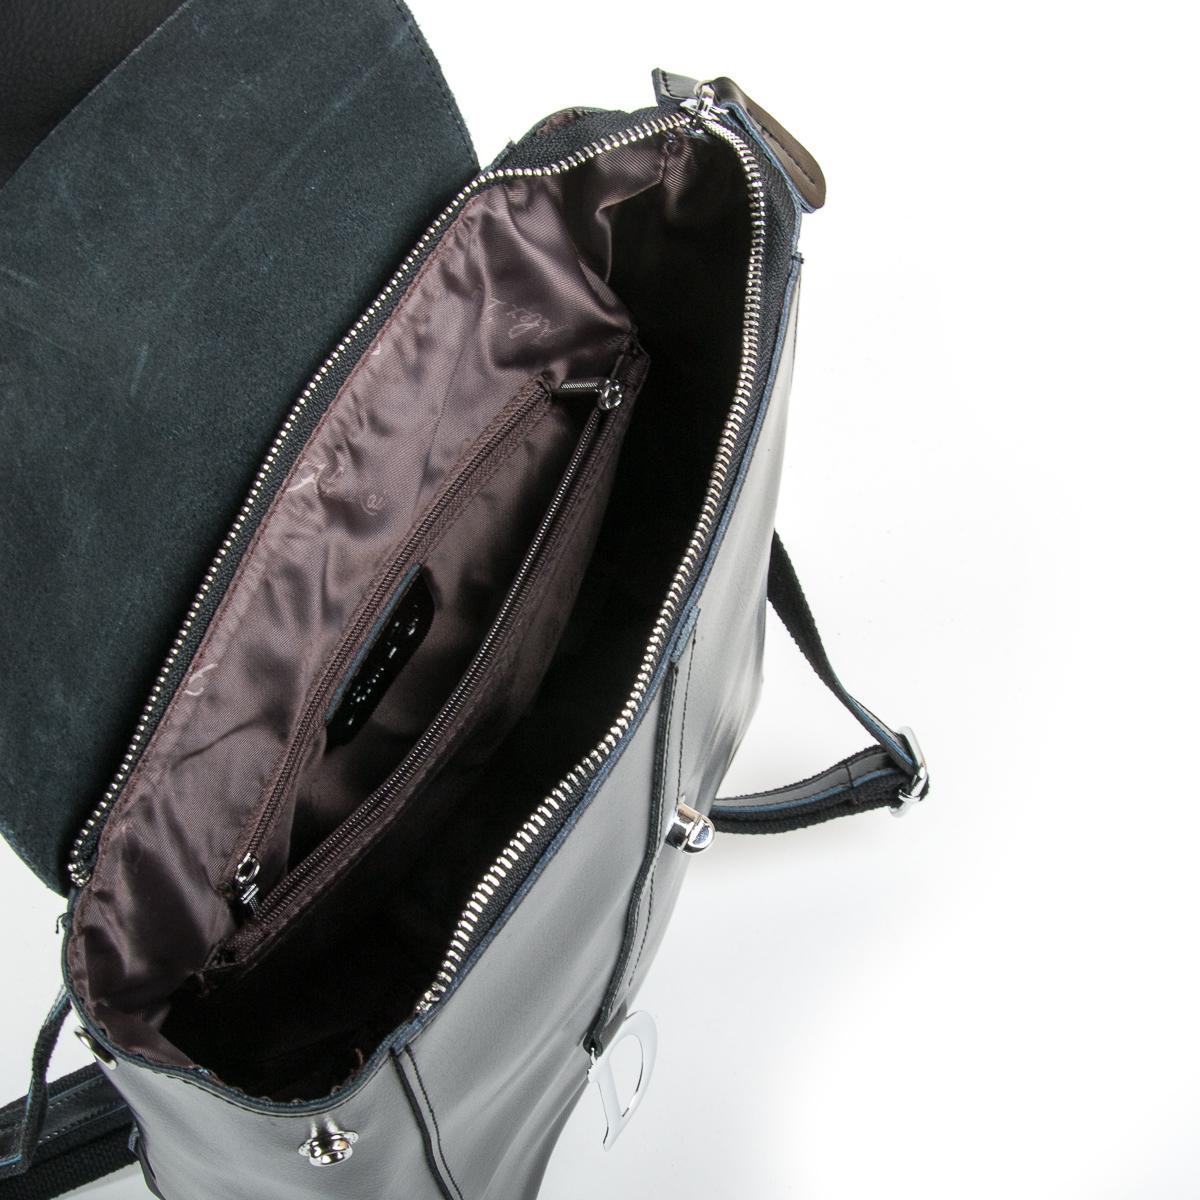 Сумка Женская Рюкзак кожа ALEX RAI 9-01 360 black - фото 5